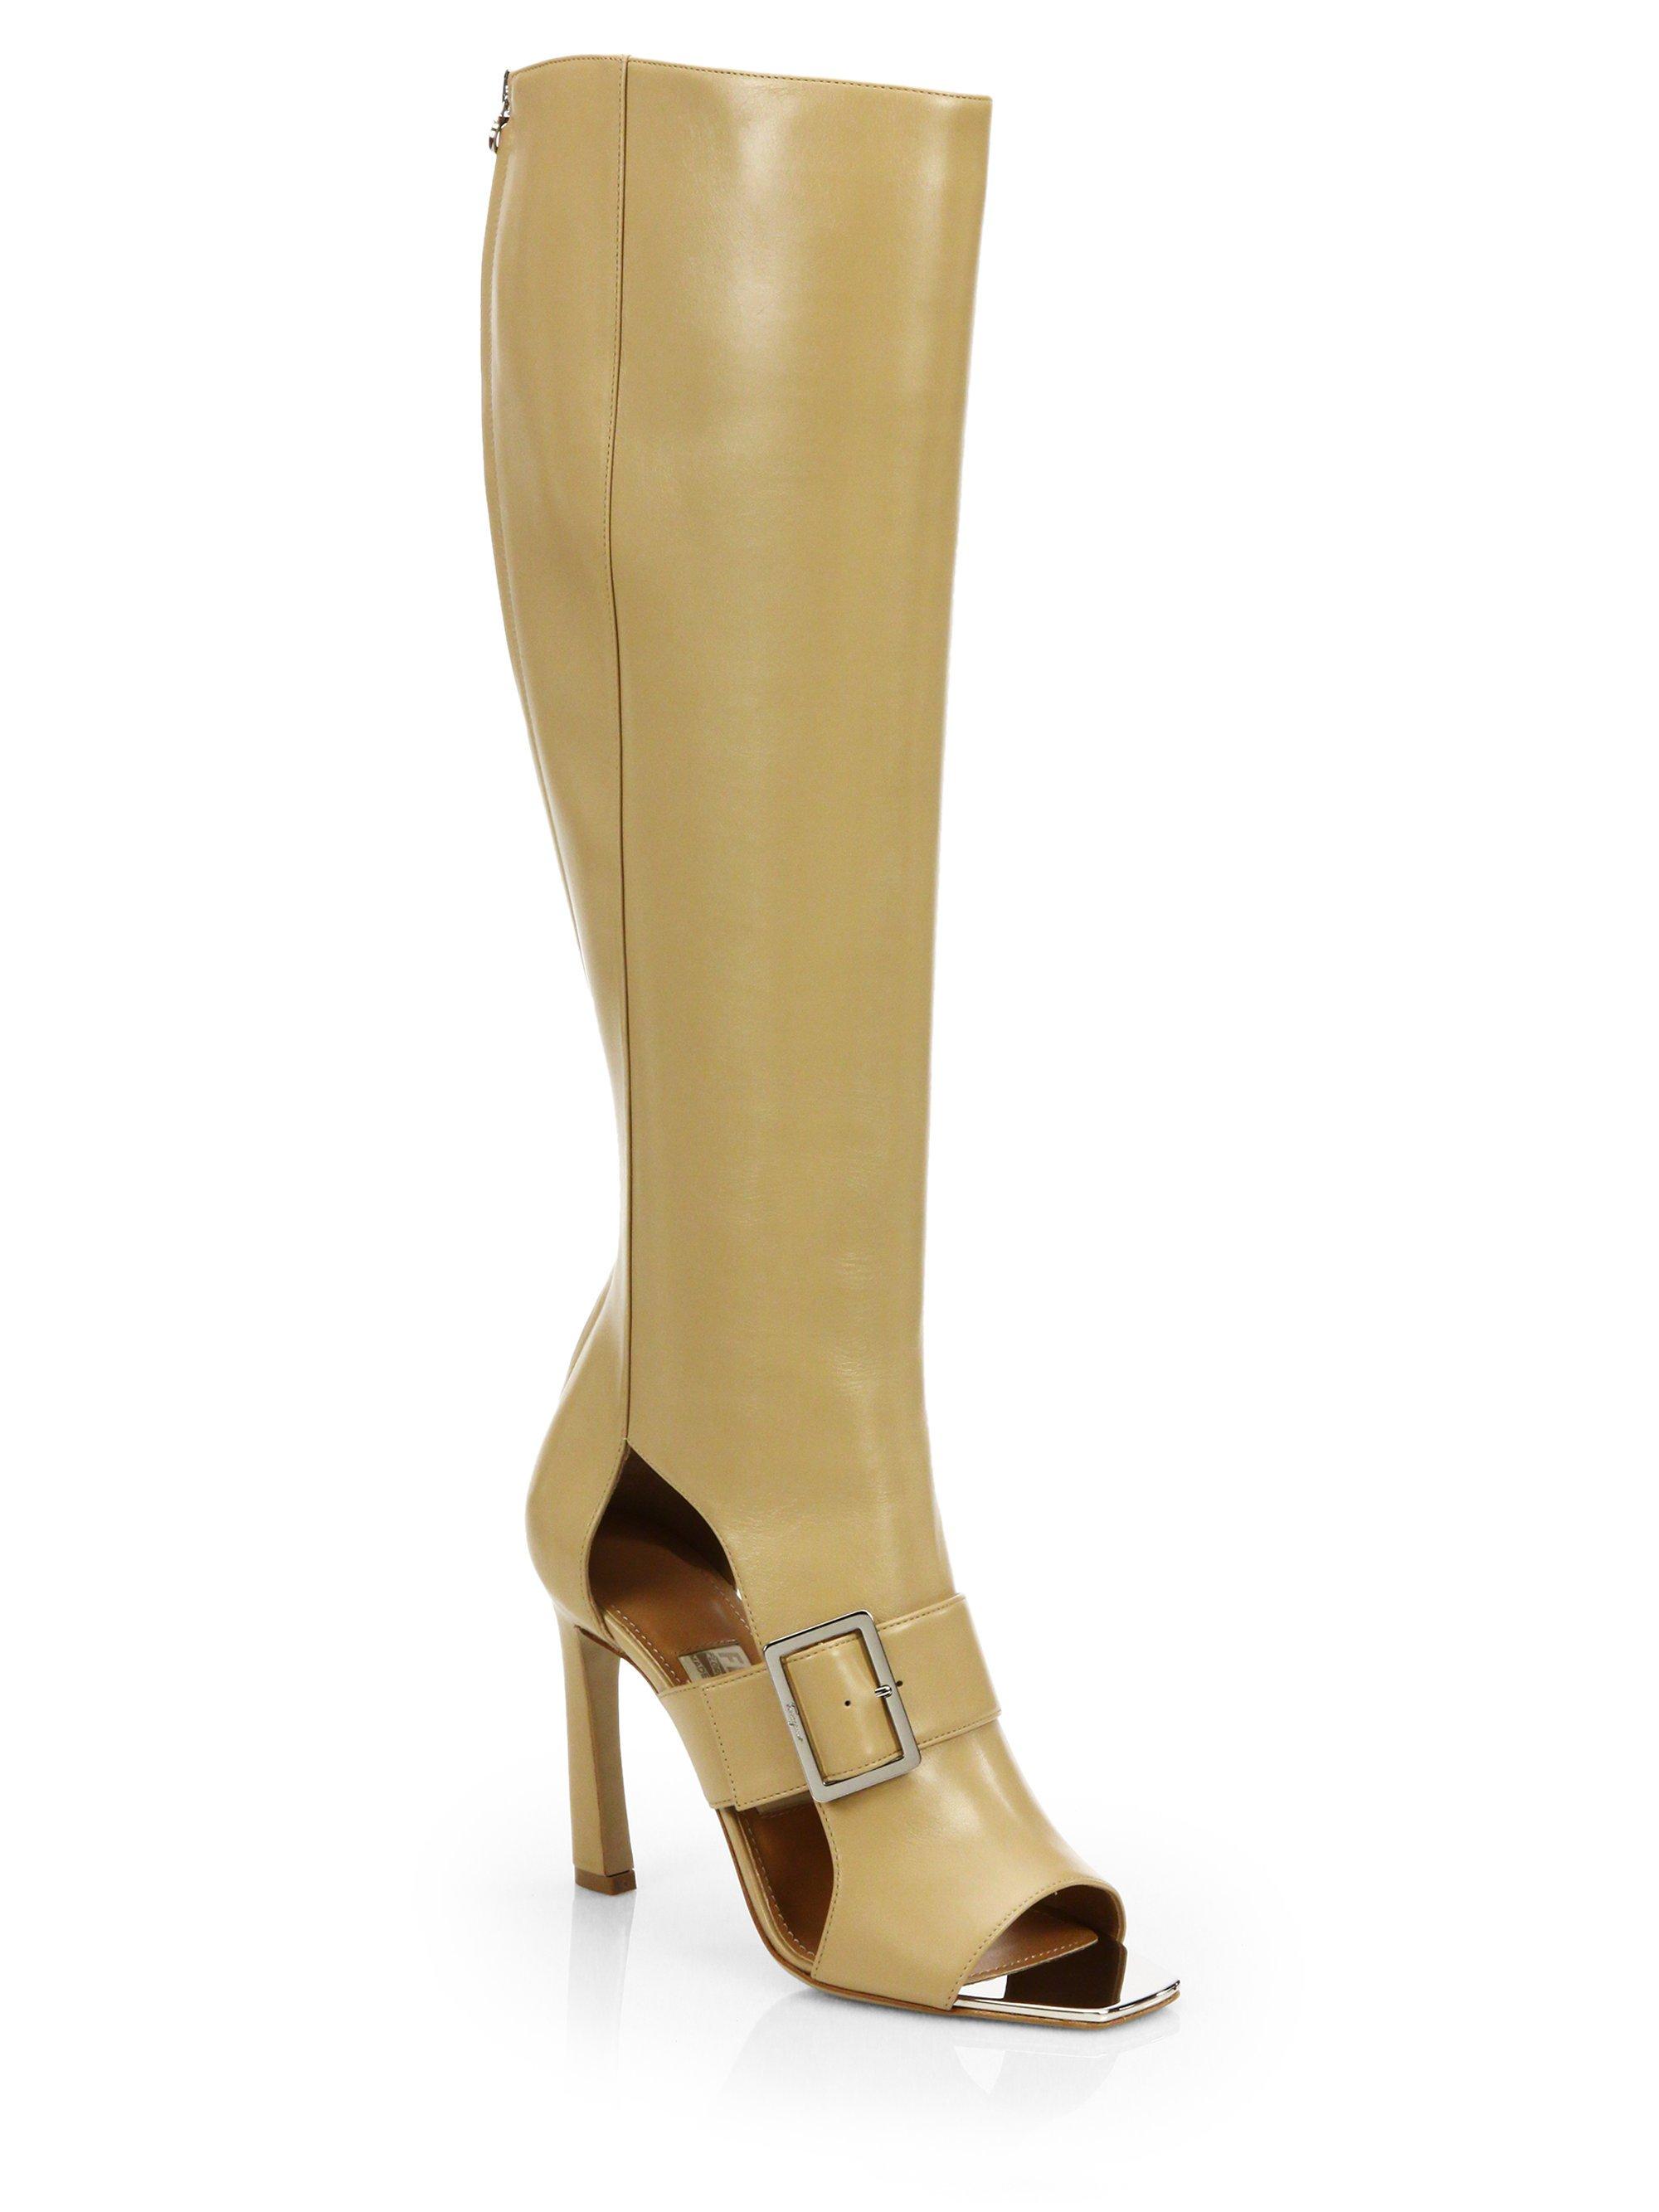 Ferragamo Pegasus Leather Opentoe Boots in Beige (SESAMO) - Lyst